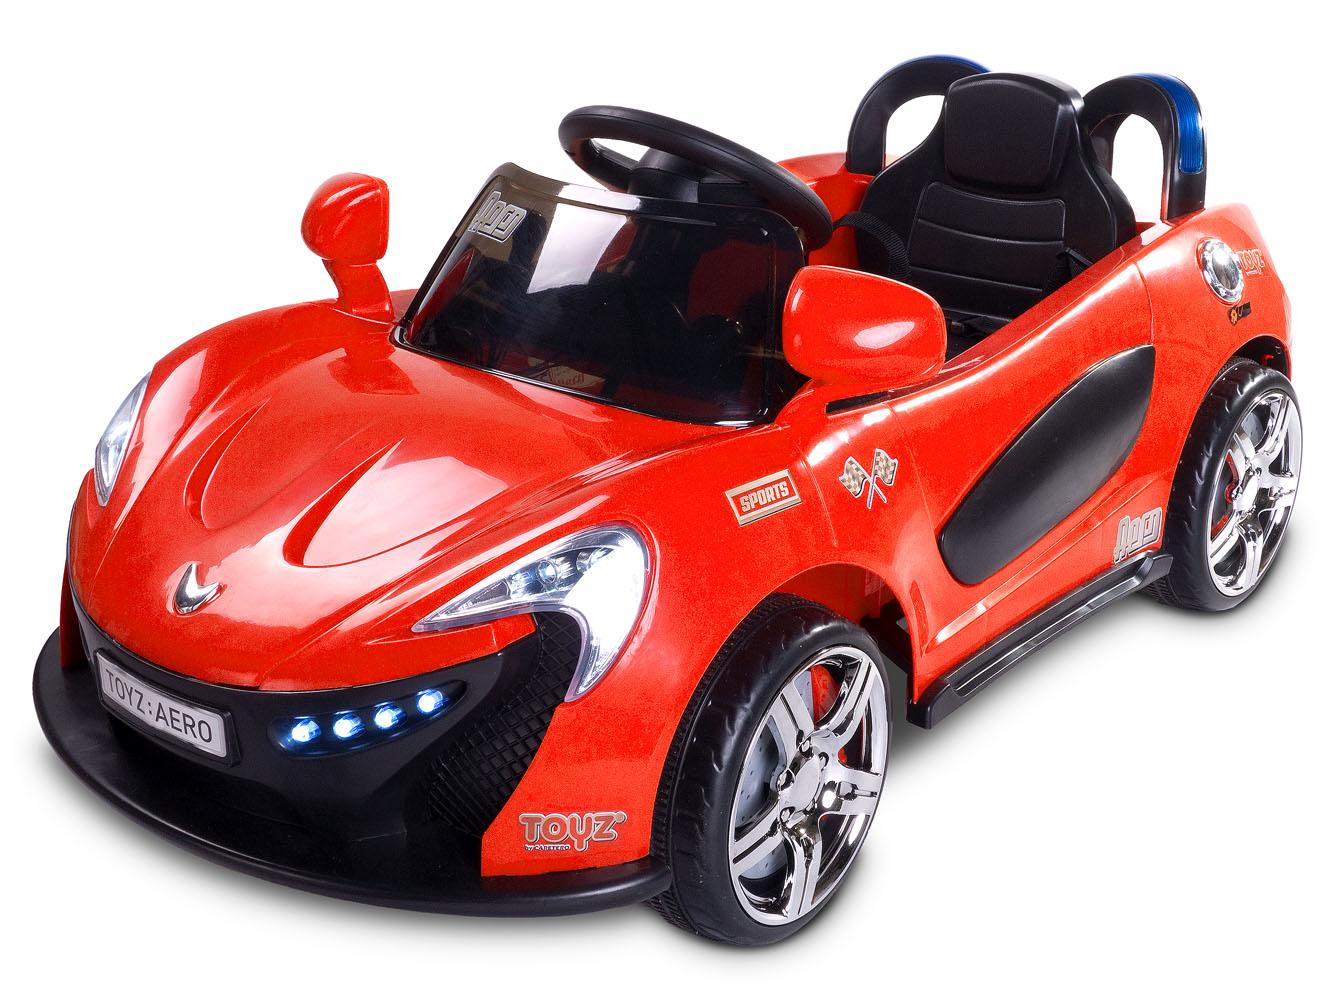 Dětské auto TOYZ Aero red na baterii Elektrické autíčko pro děti Toyz